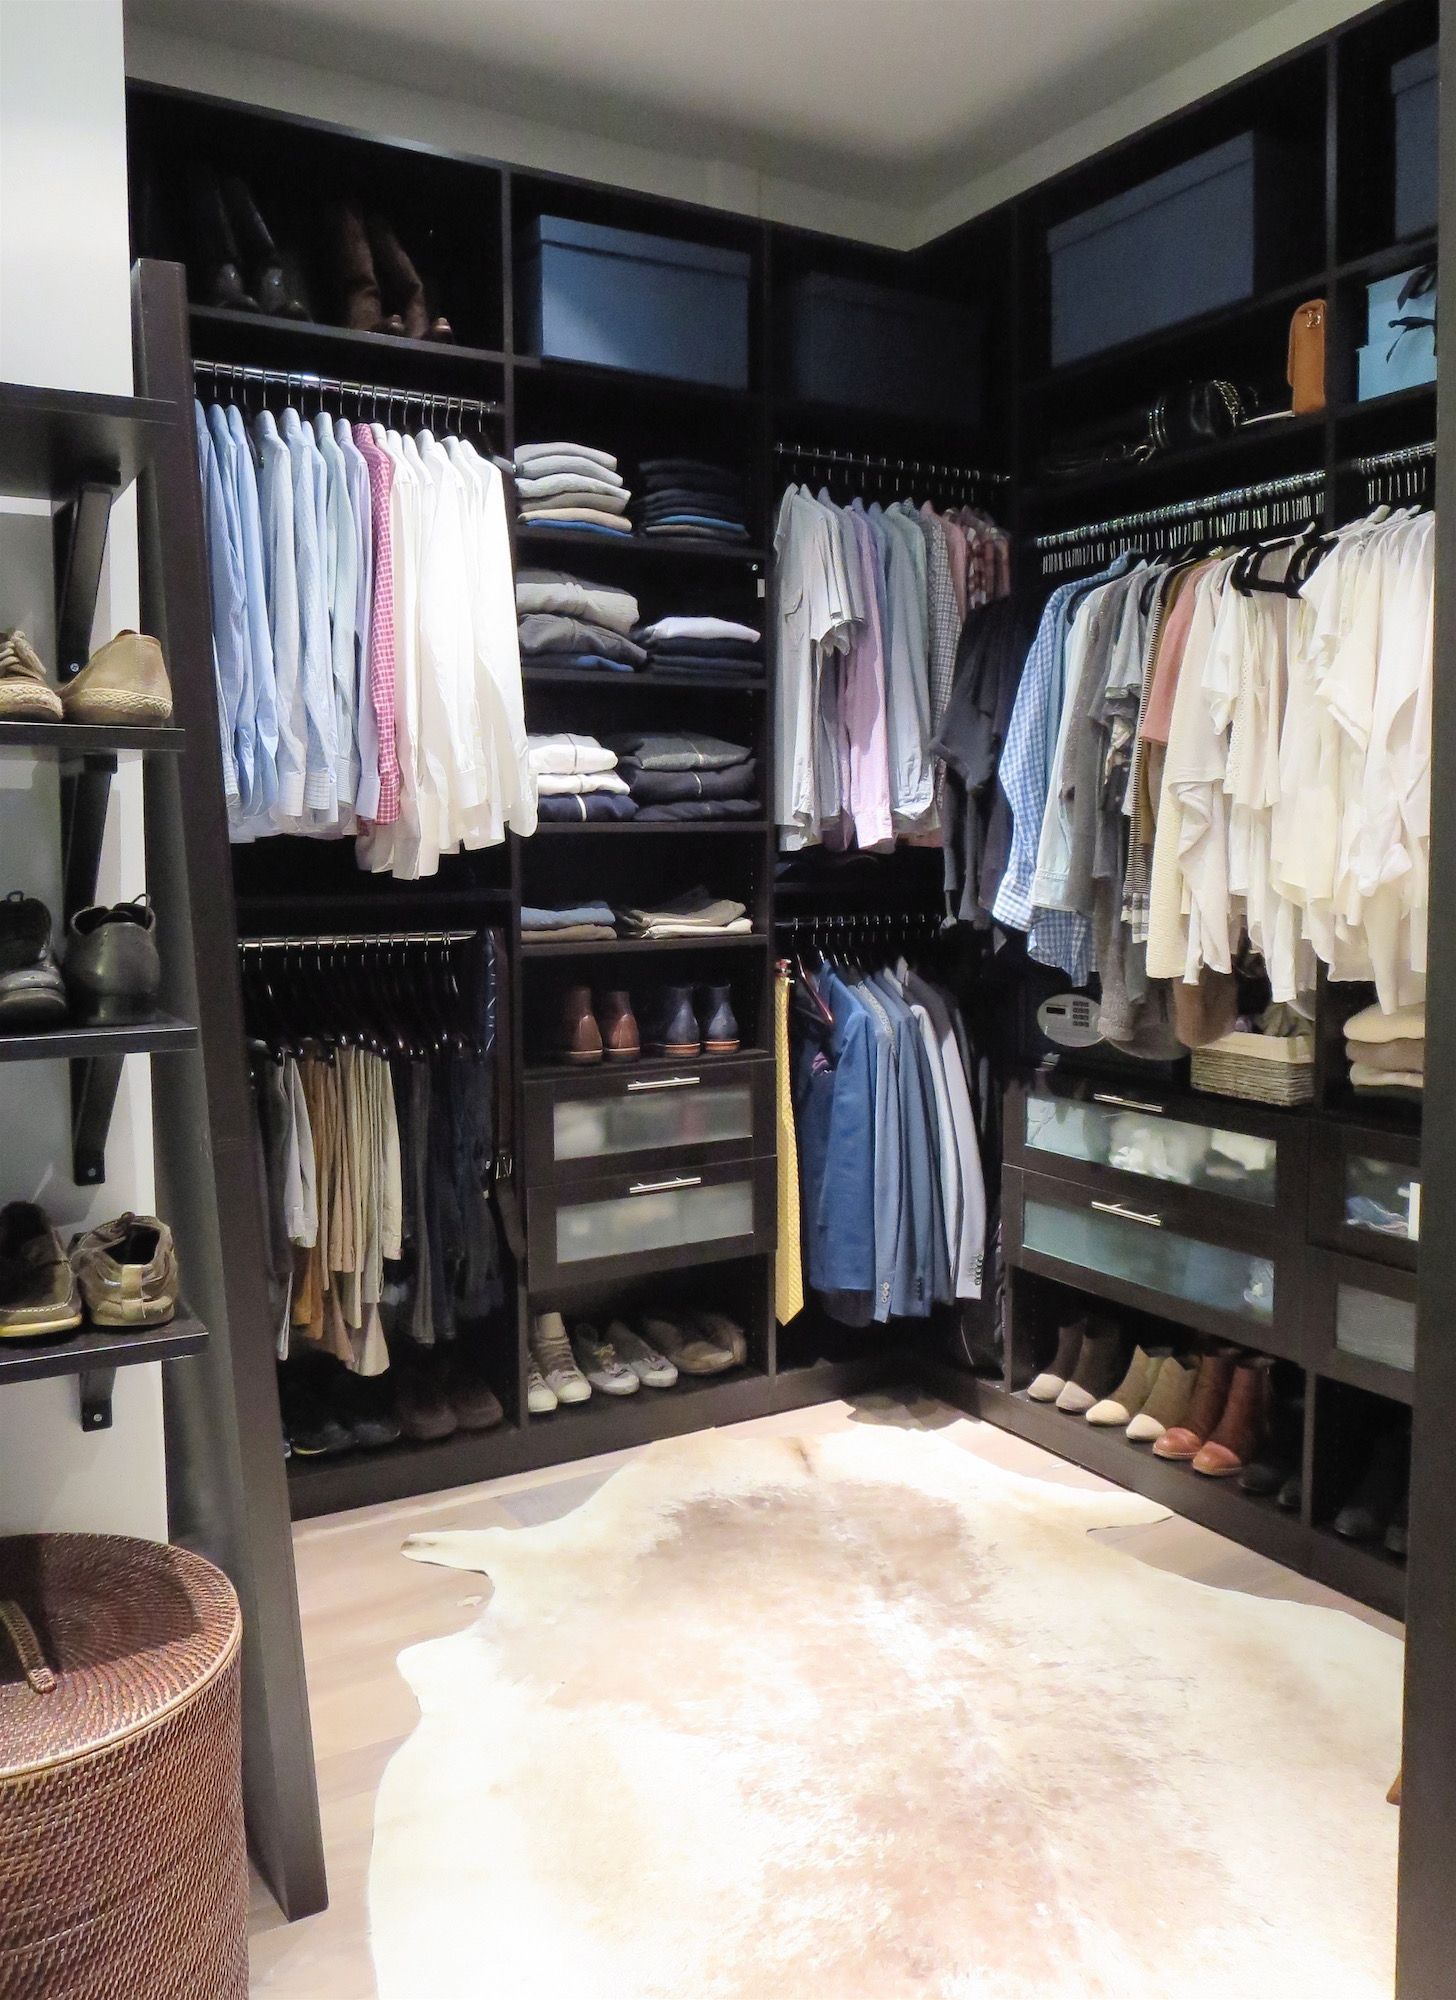 30 Stylish Closet Organization Tips - Best Closet Organizing Ideas